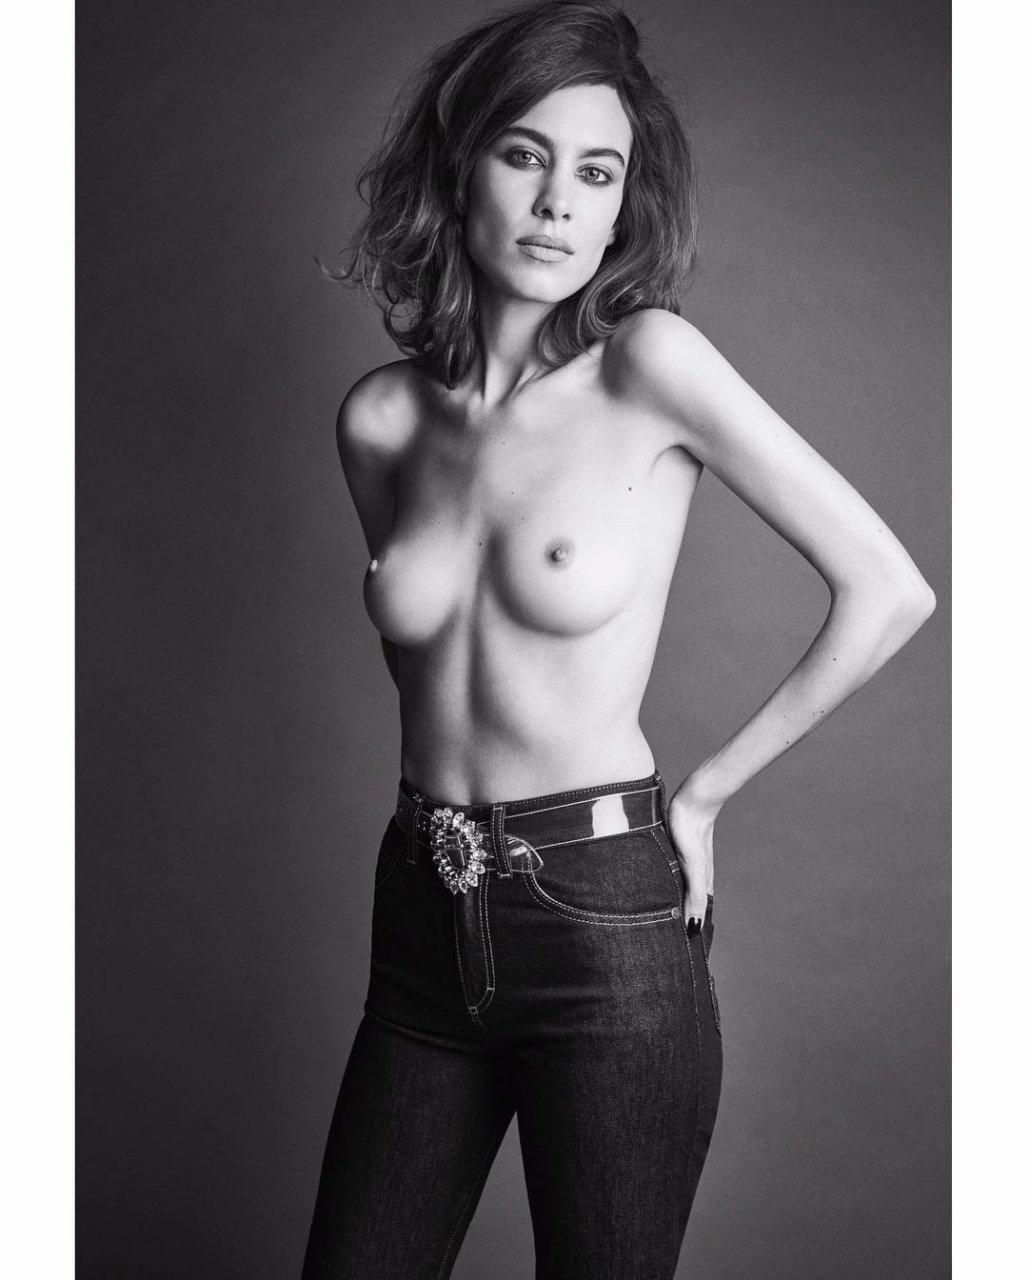 alexa naked